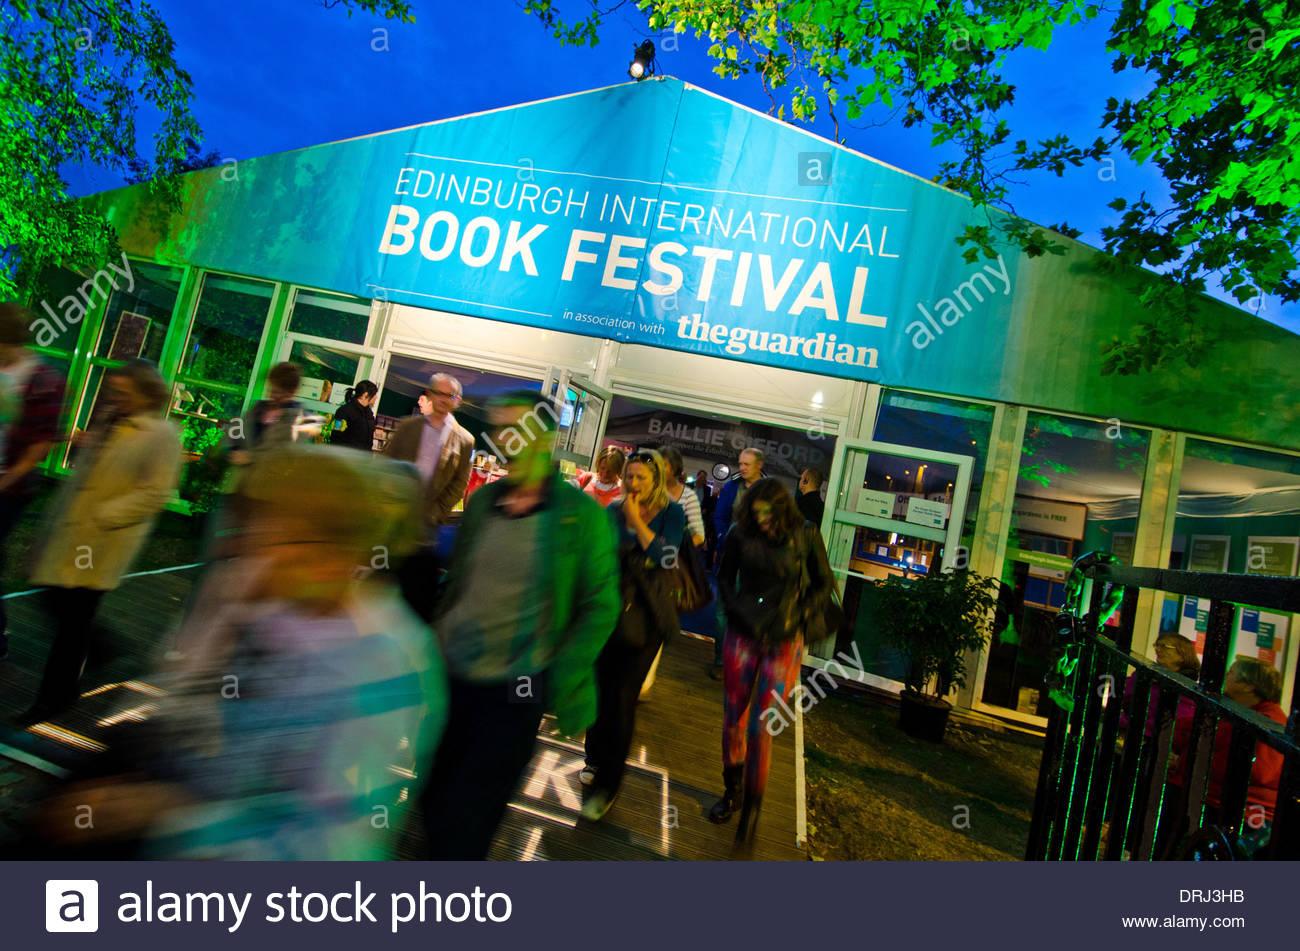 The entrance of the Edinburgh International Book Festival in Charlotte Square gardens in Edinburgh - Stock Image